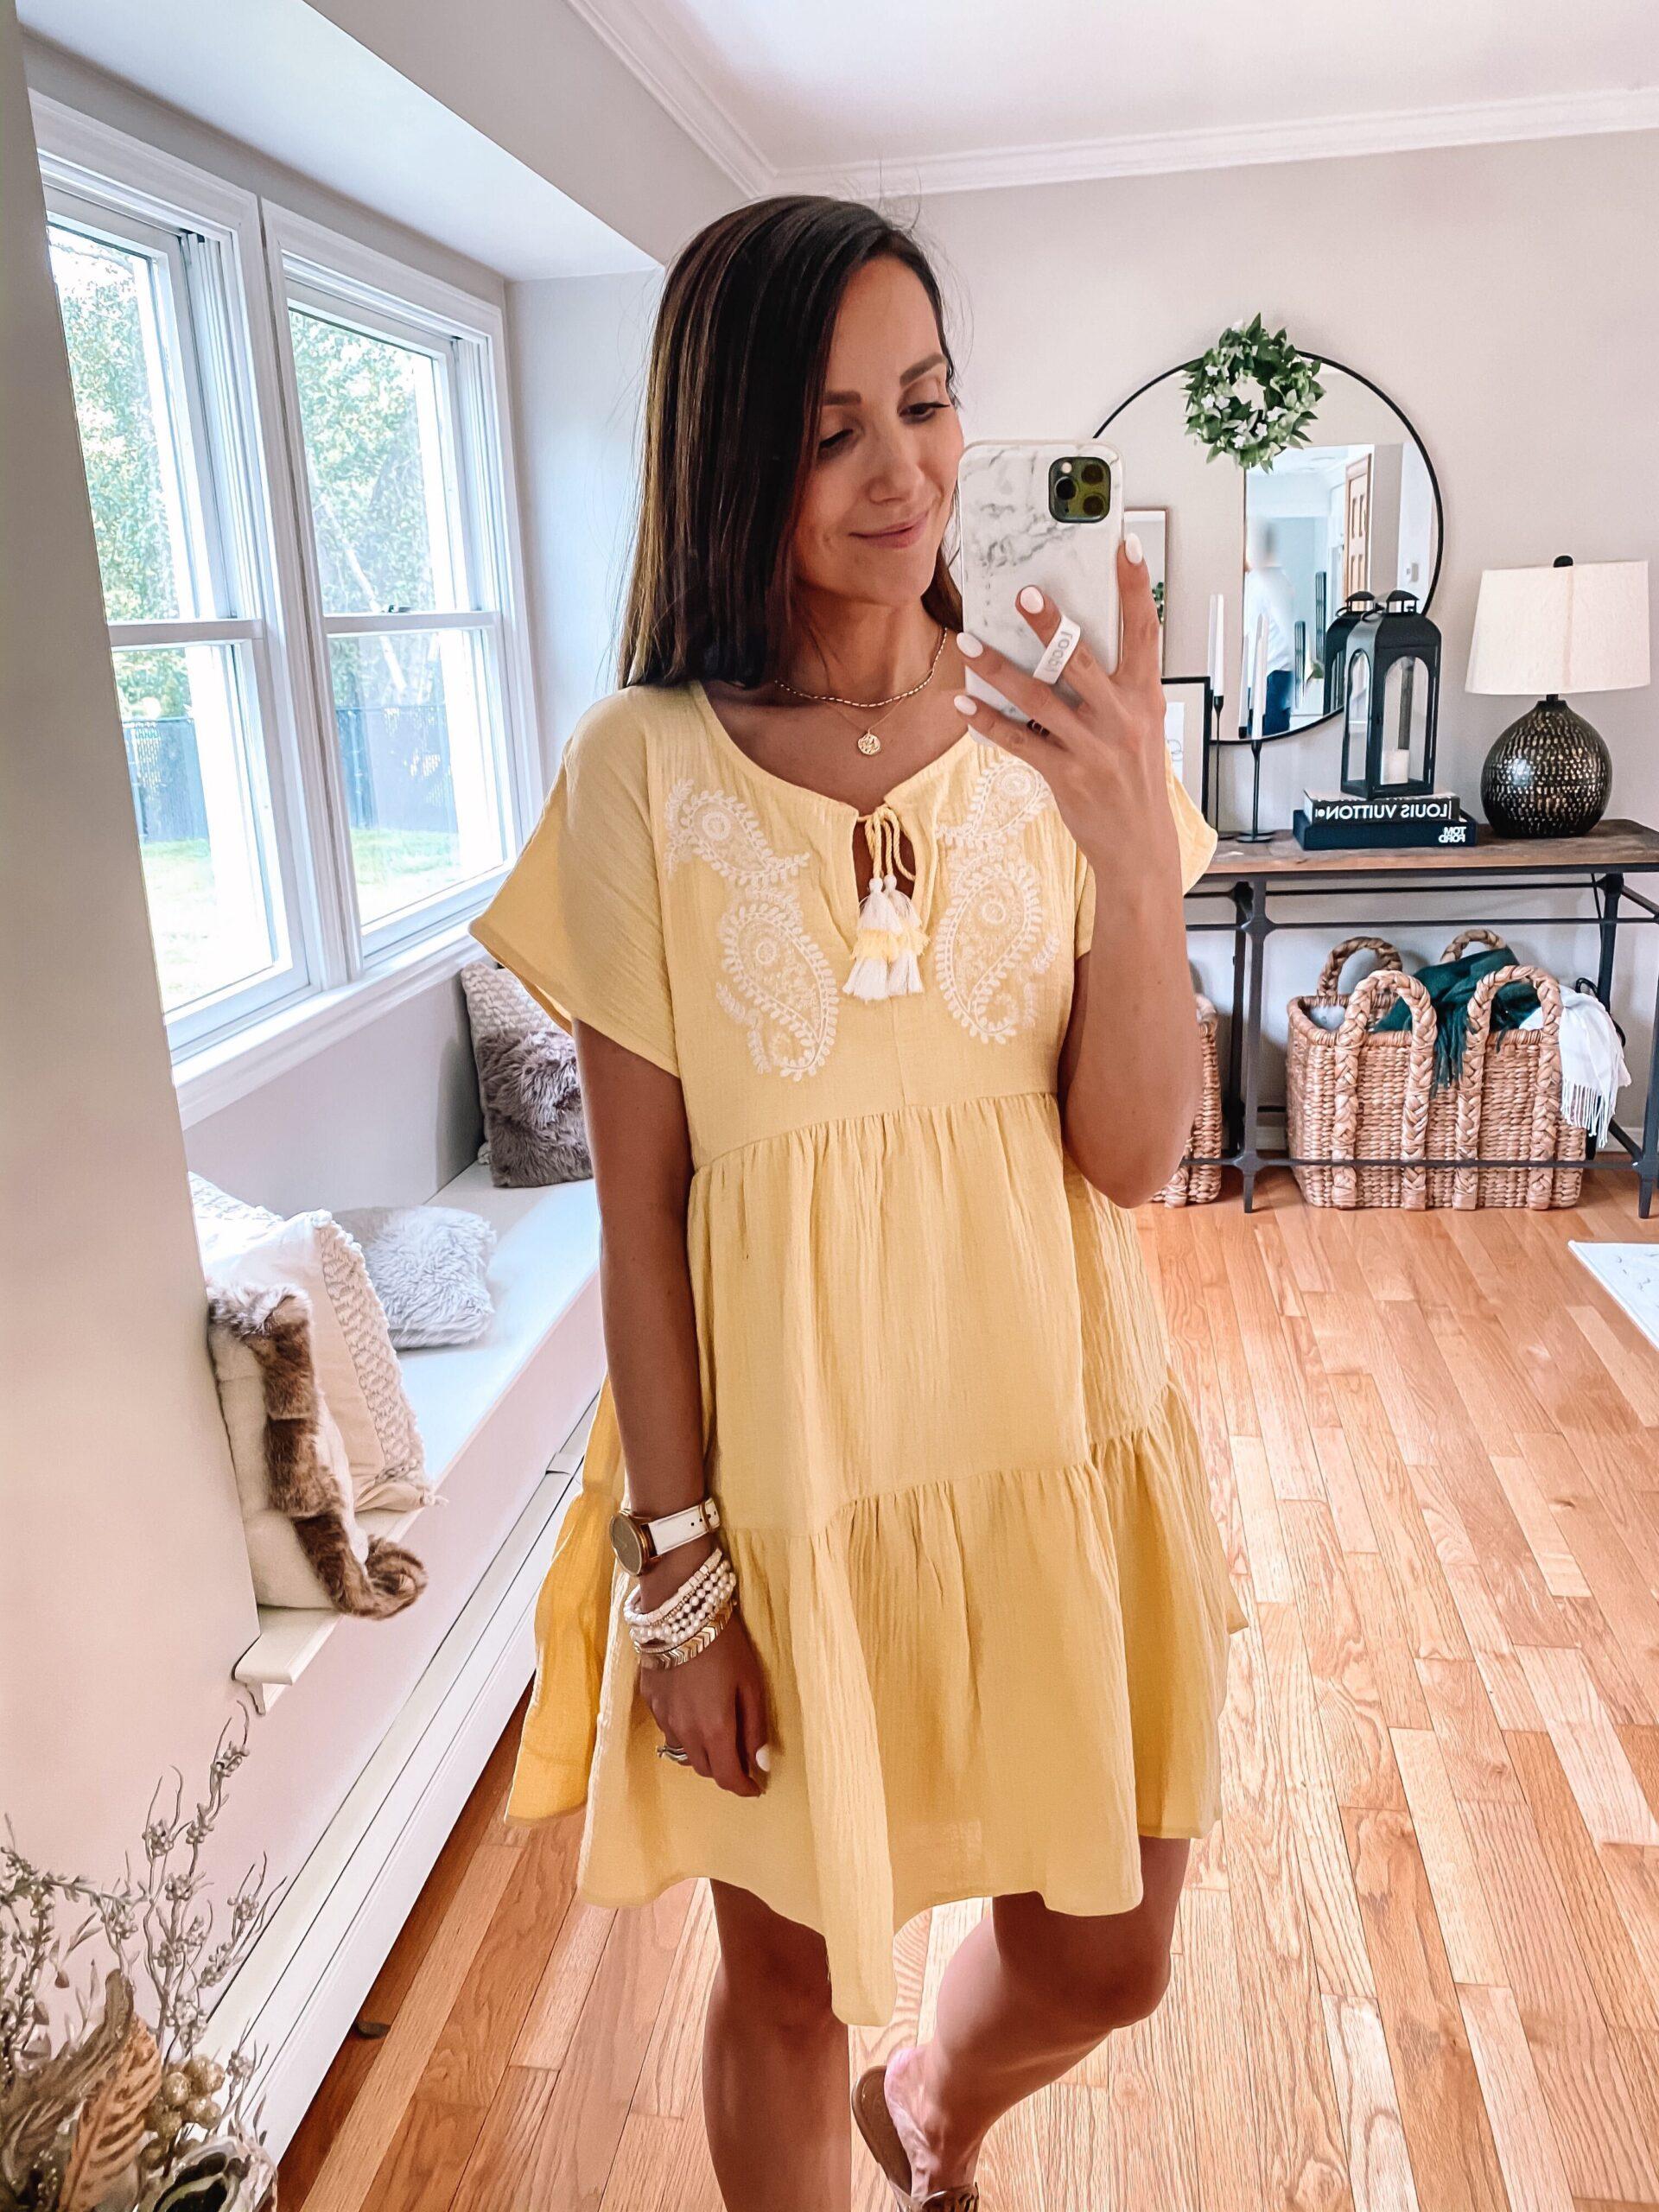 walmart yellow dress, walmart fashion find